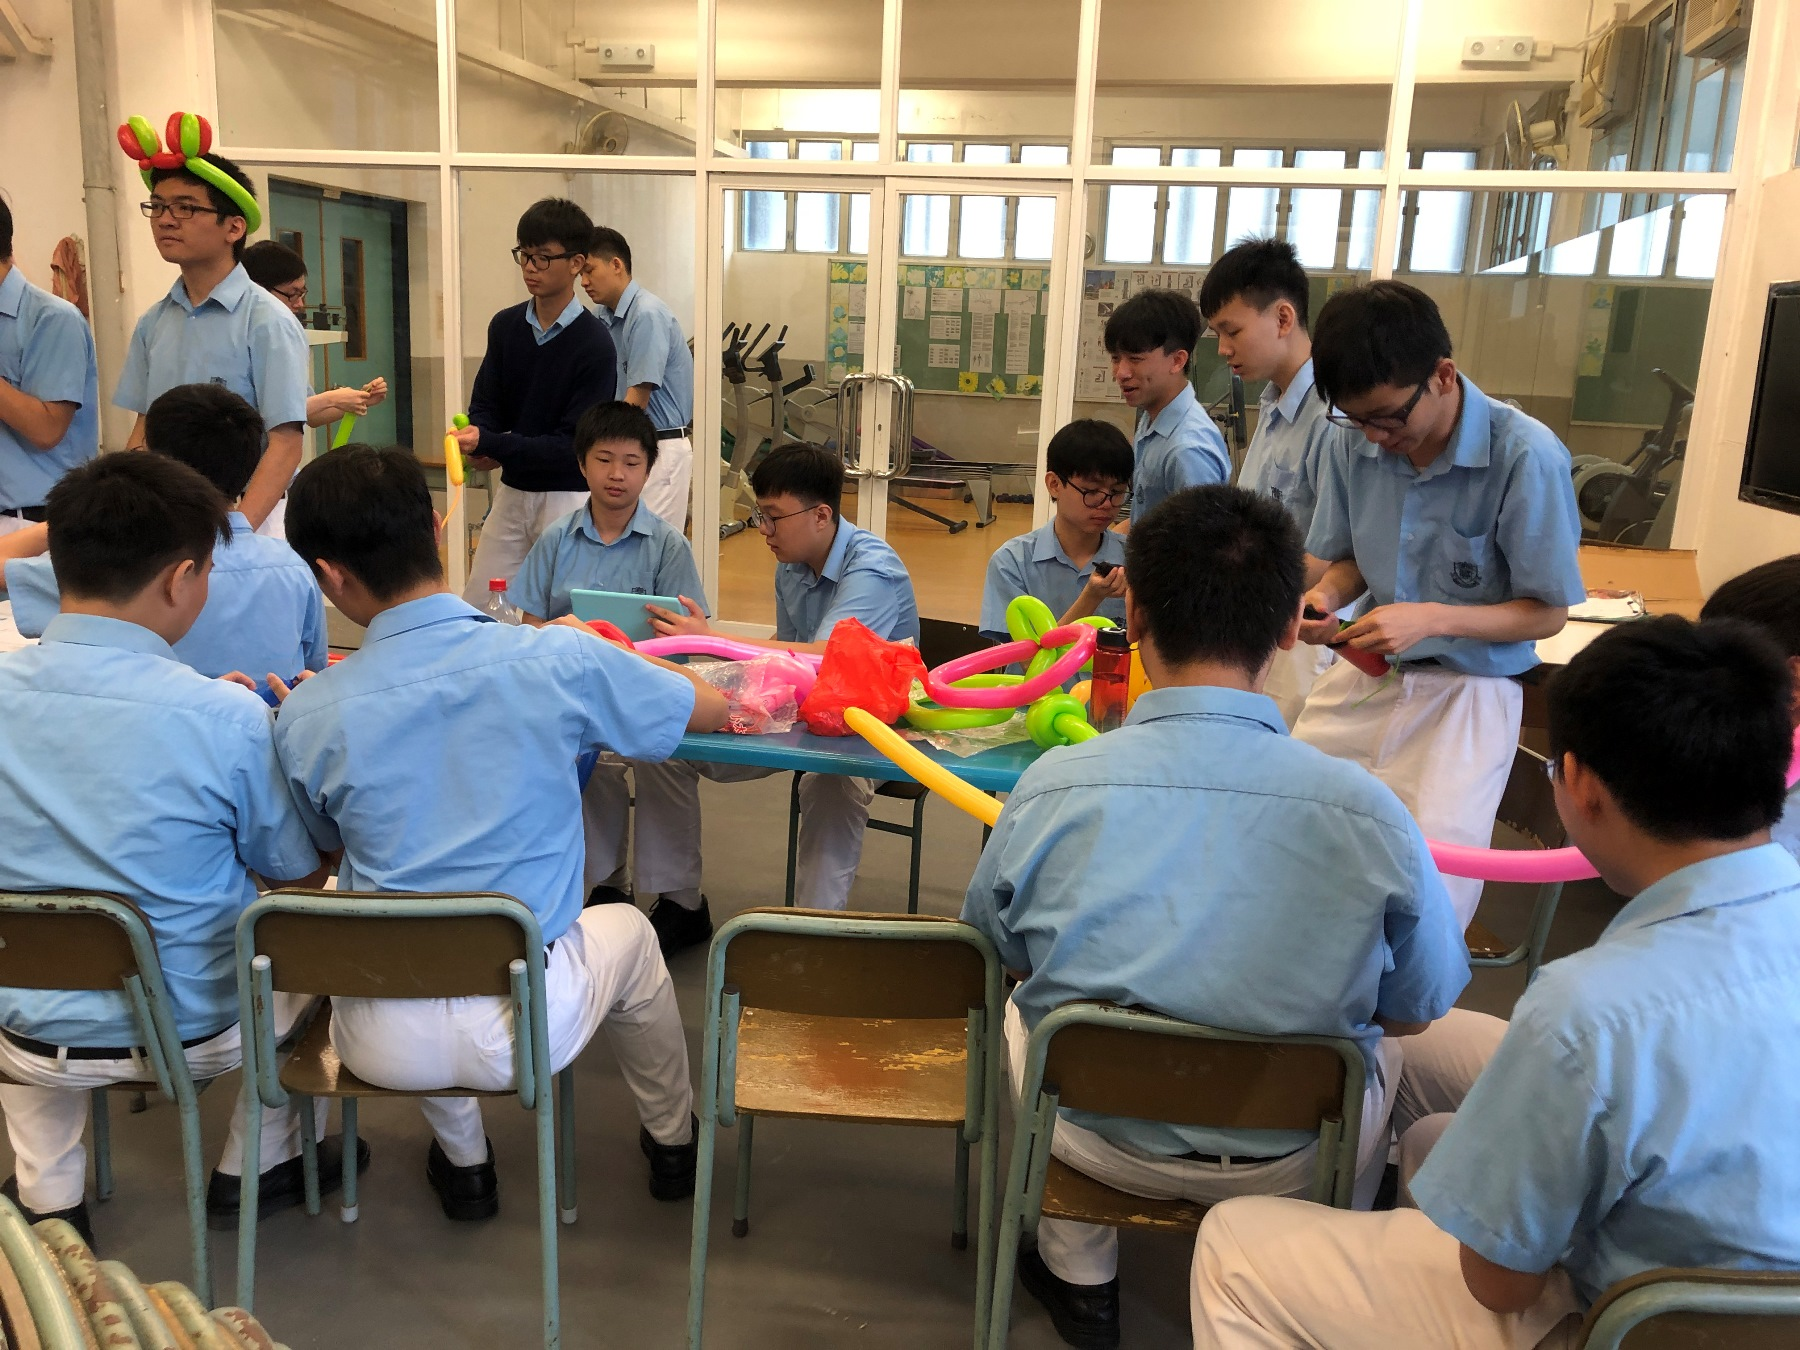 http://npc.edu.hk/sites/default/files/img_8355_1.jpg